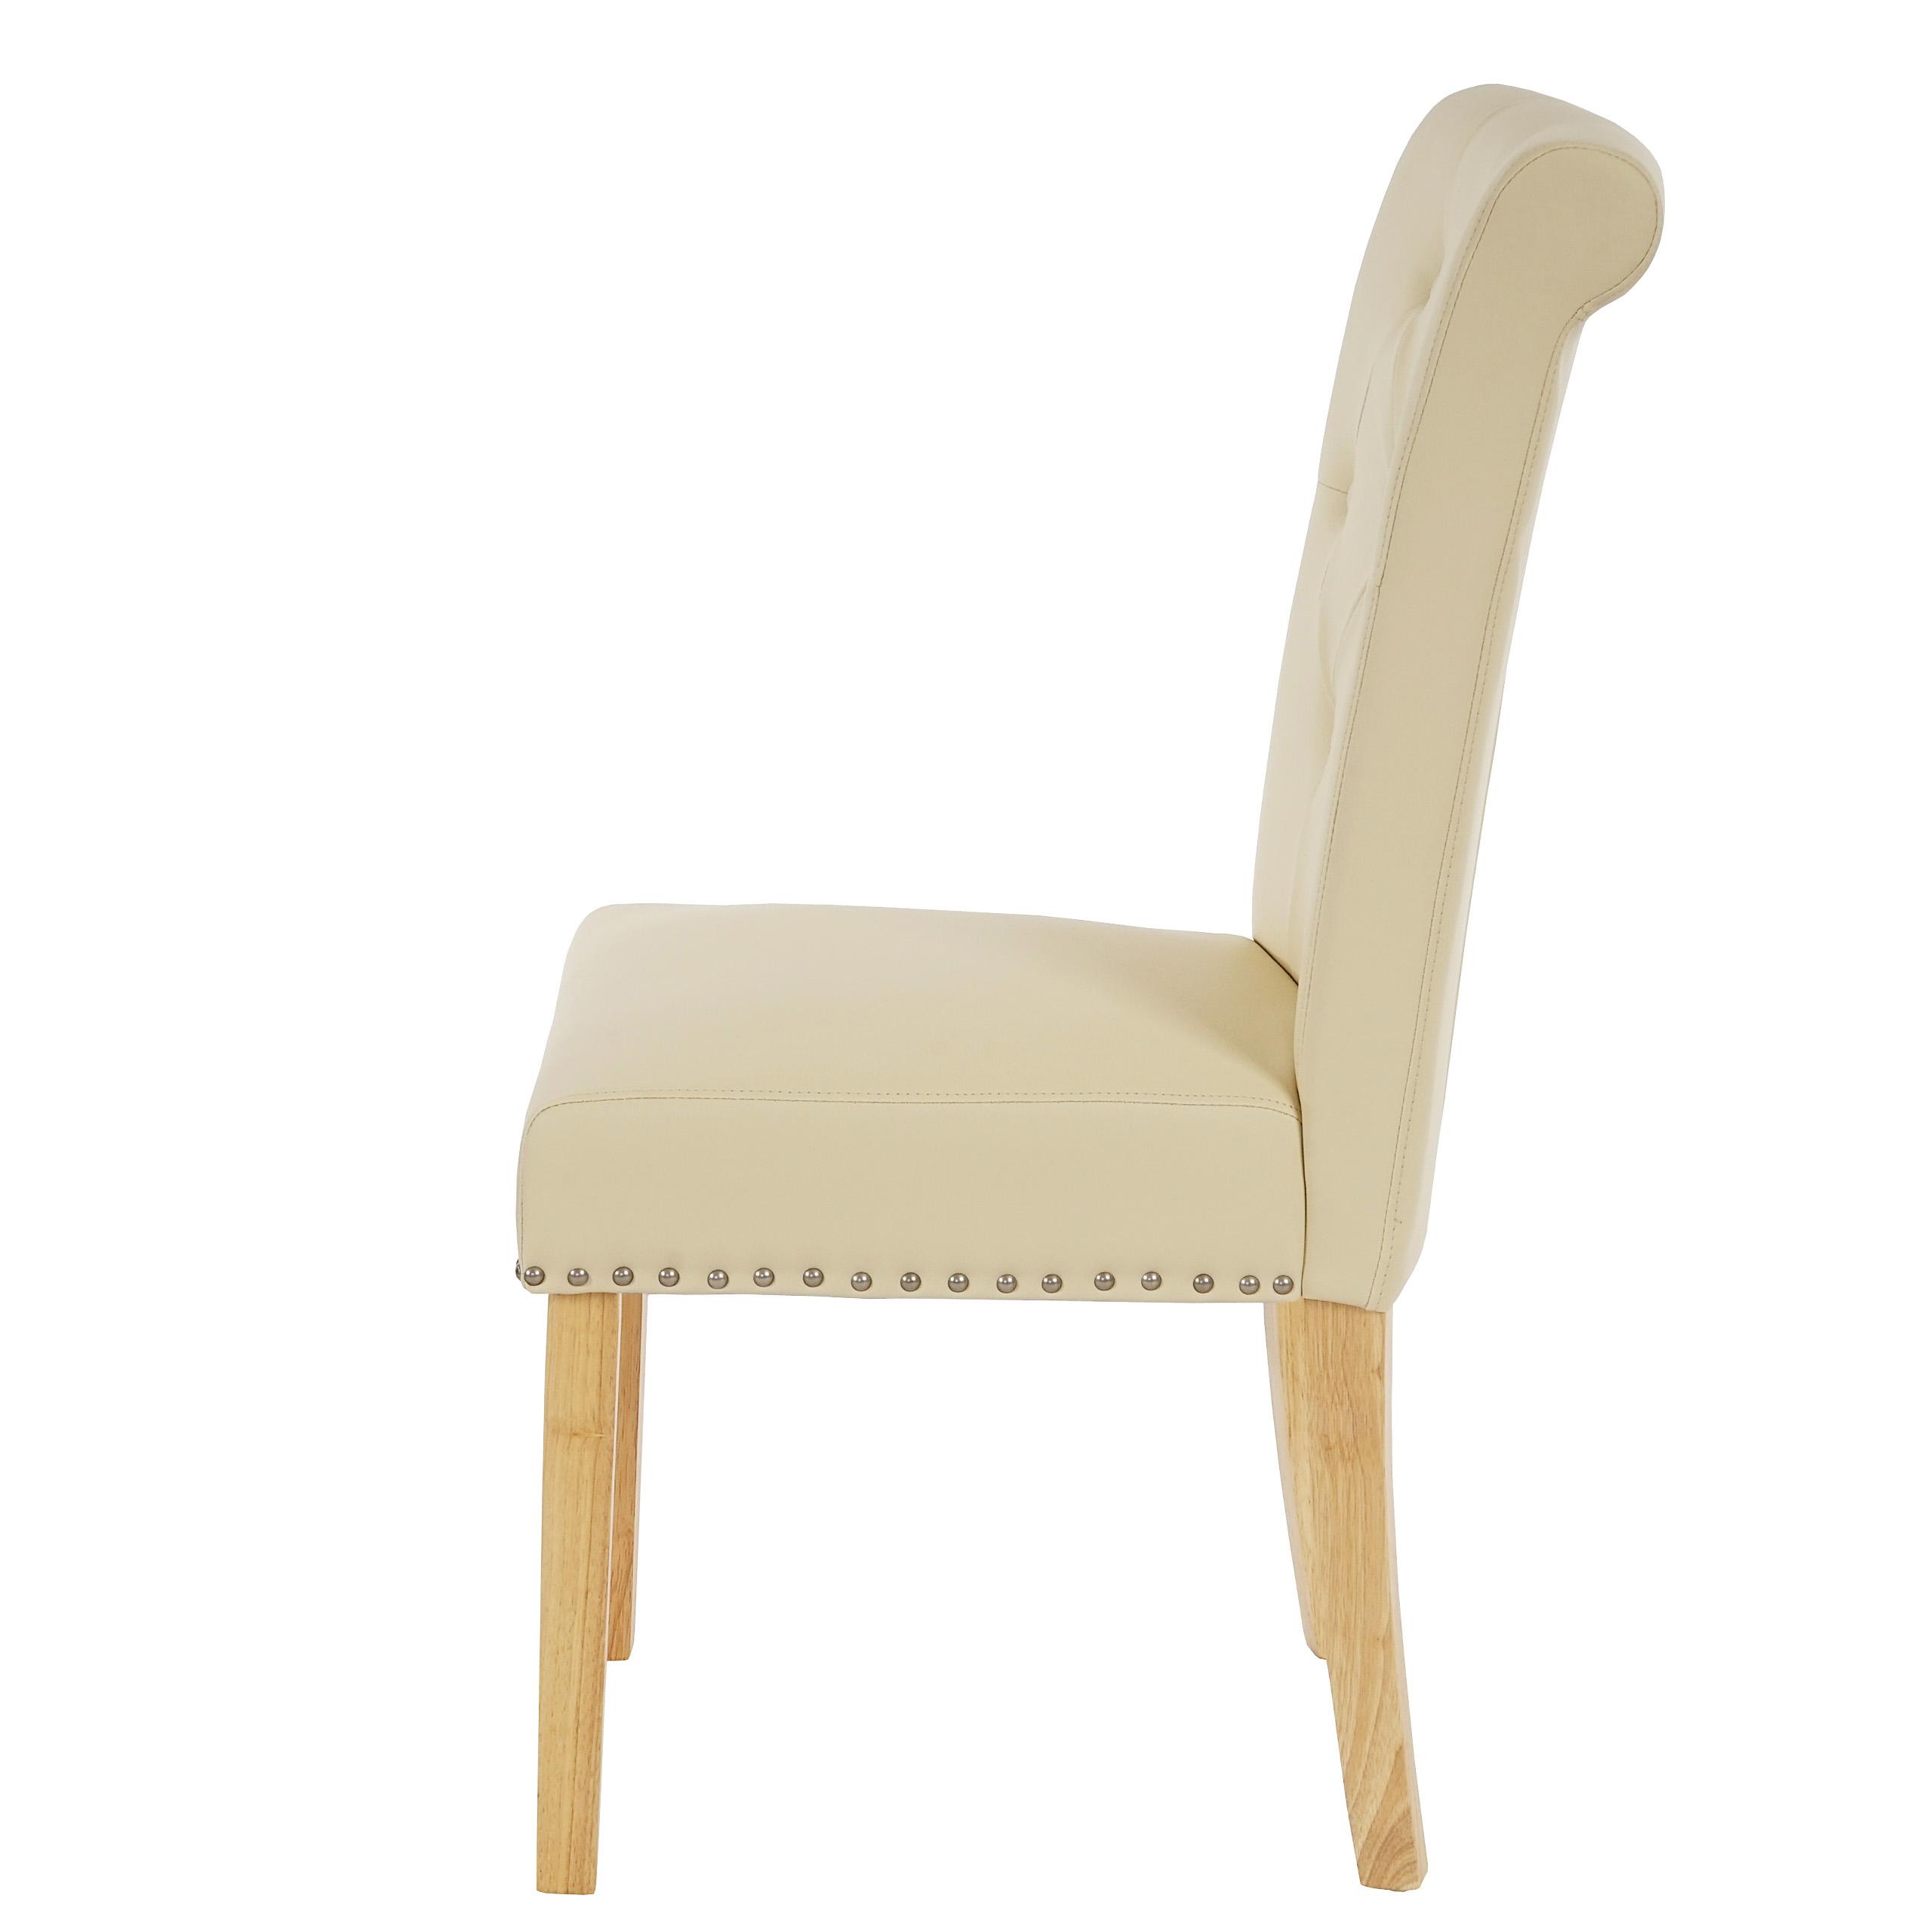 2x esszimmerstuhl chesterfield ii stuhl lehnstuhl nieten kunstleder creme helle beine. Black Bedroom Furniture Sets. Home Design Ideas